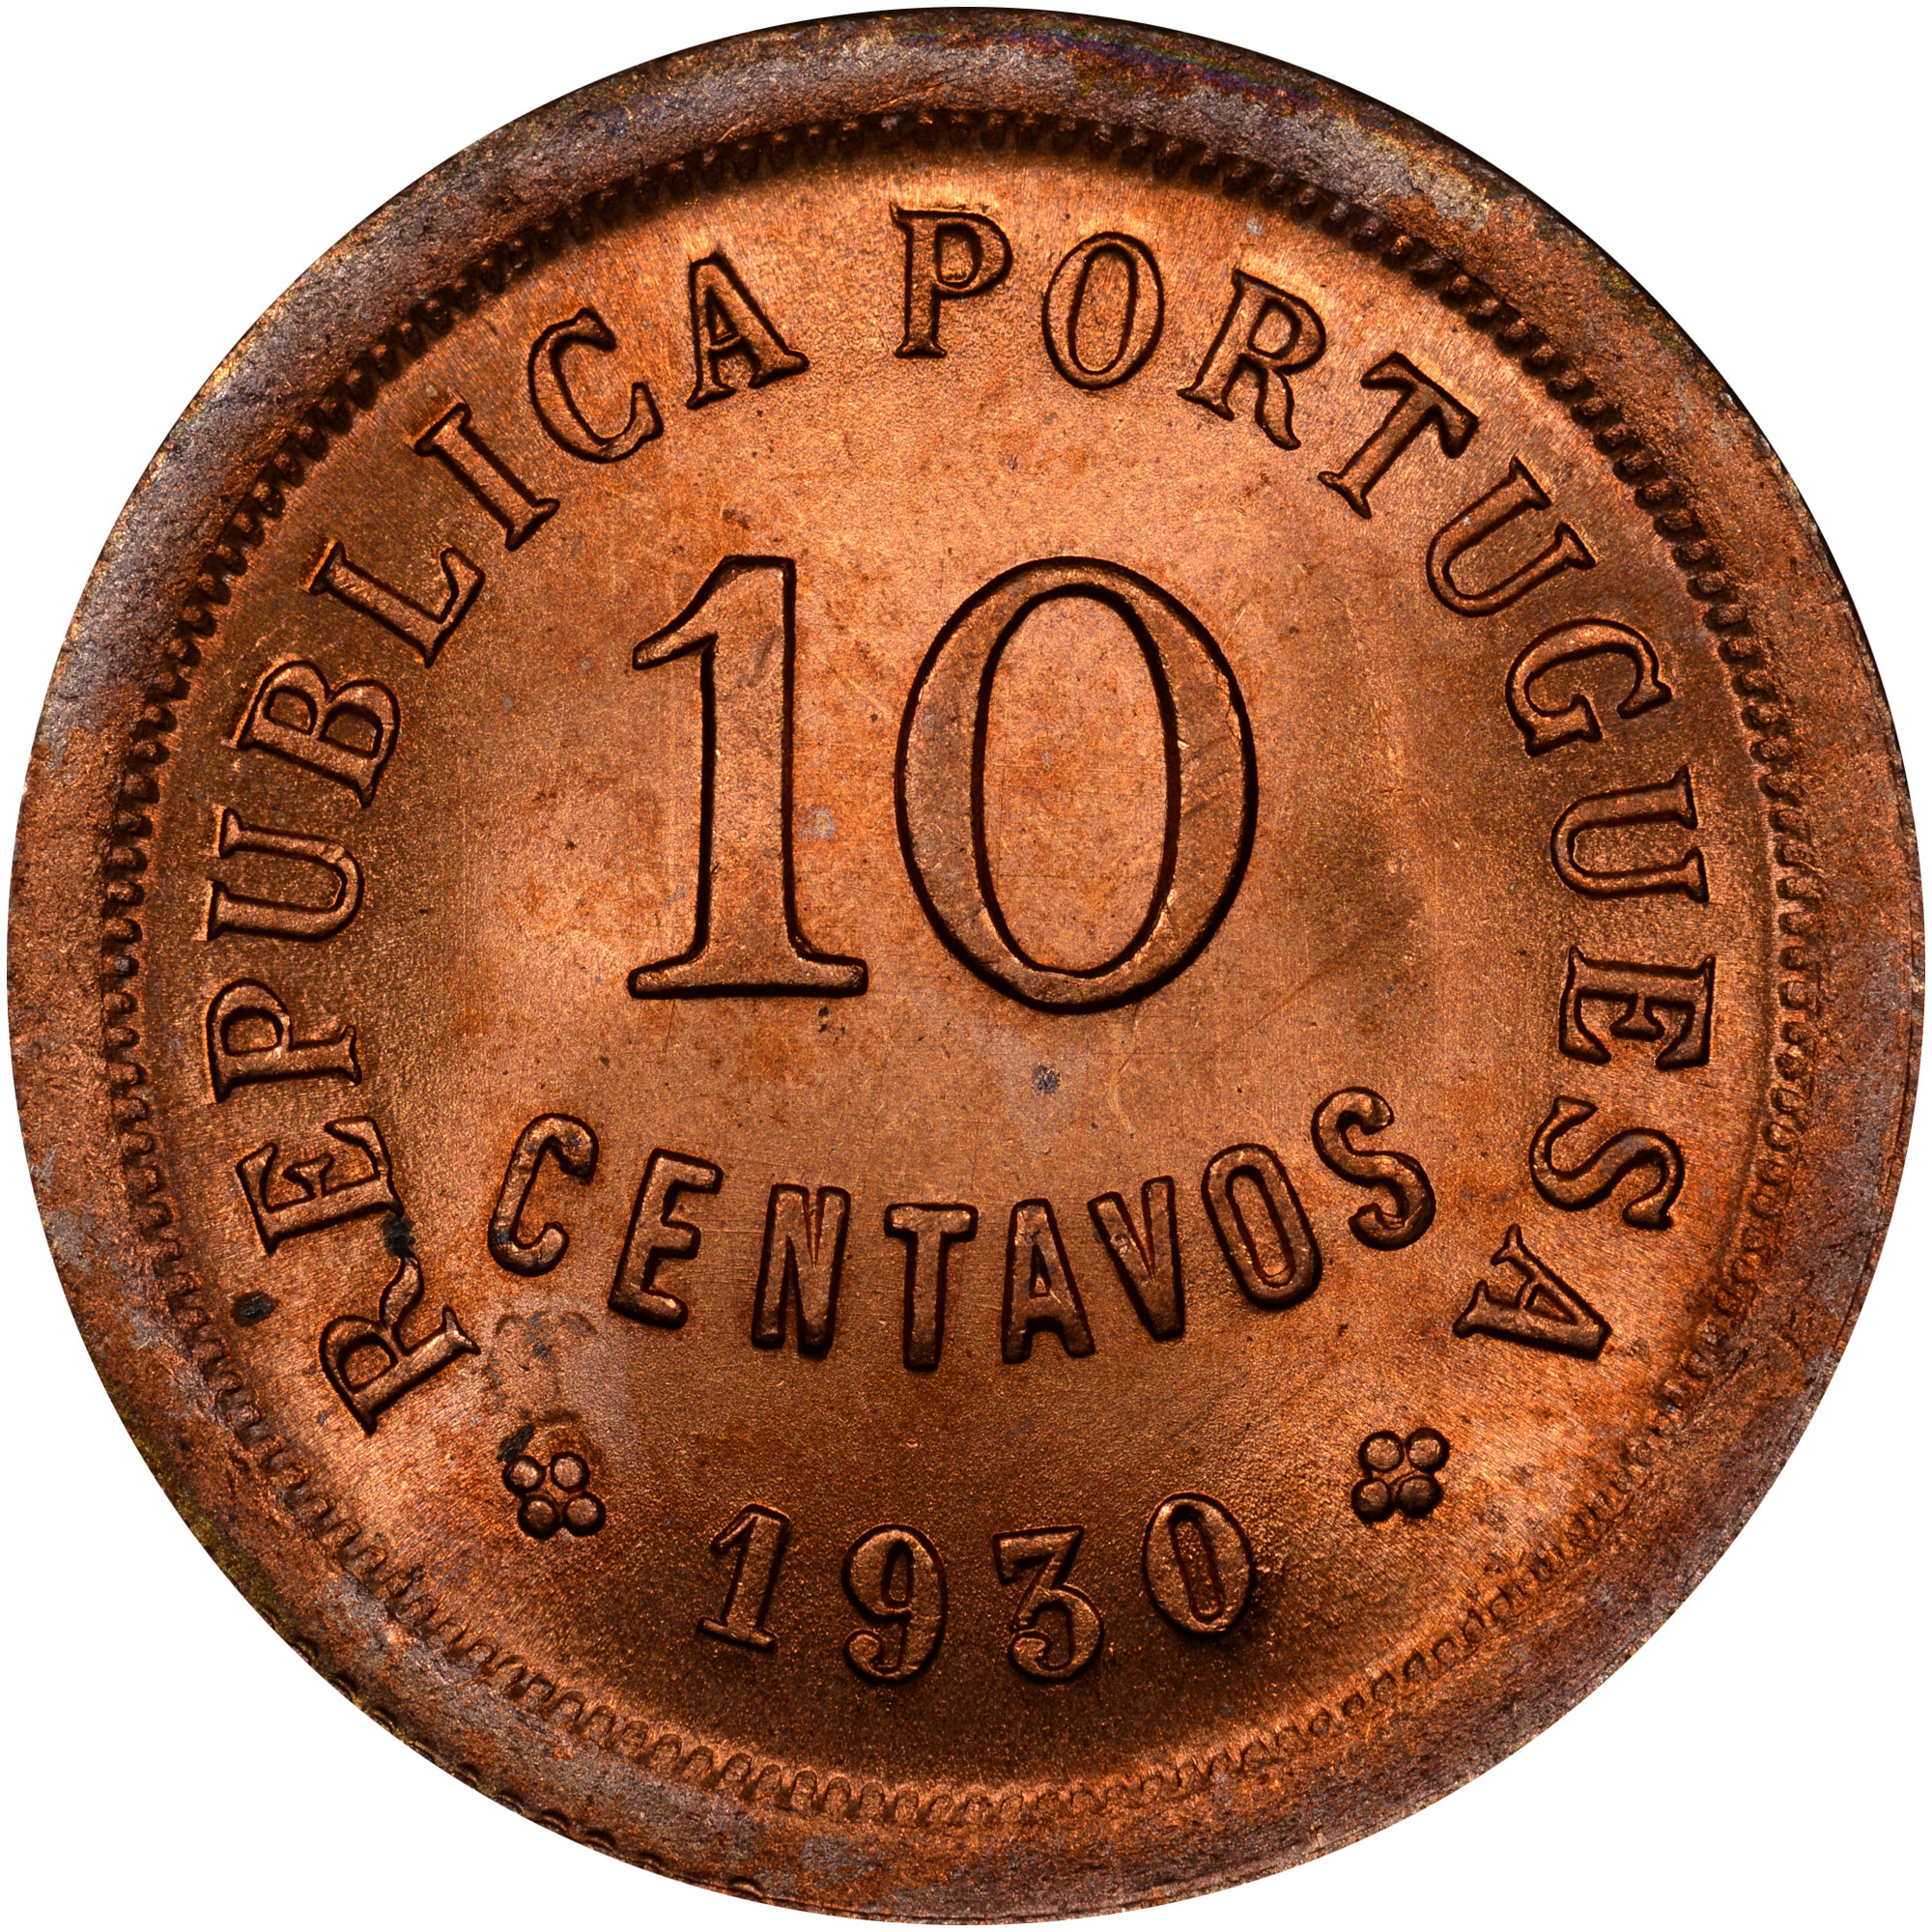 1930 Cape Verde 10 Centavos obverse